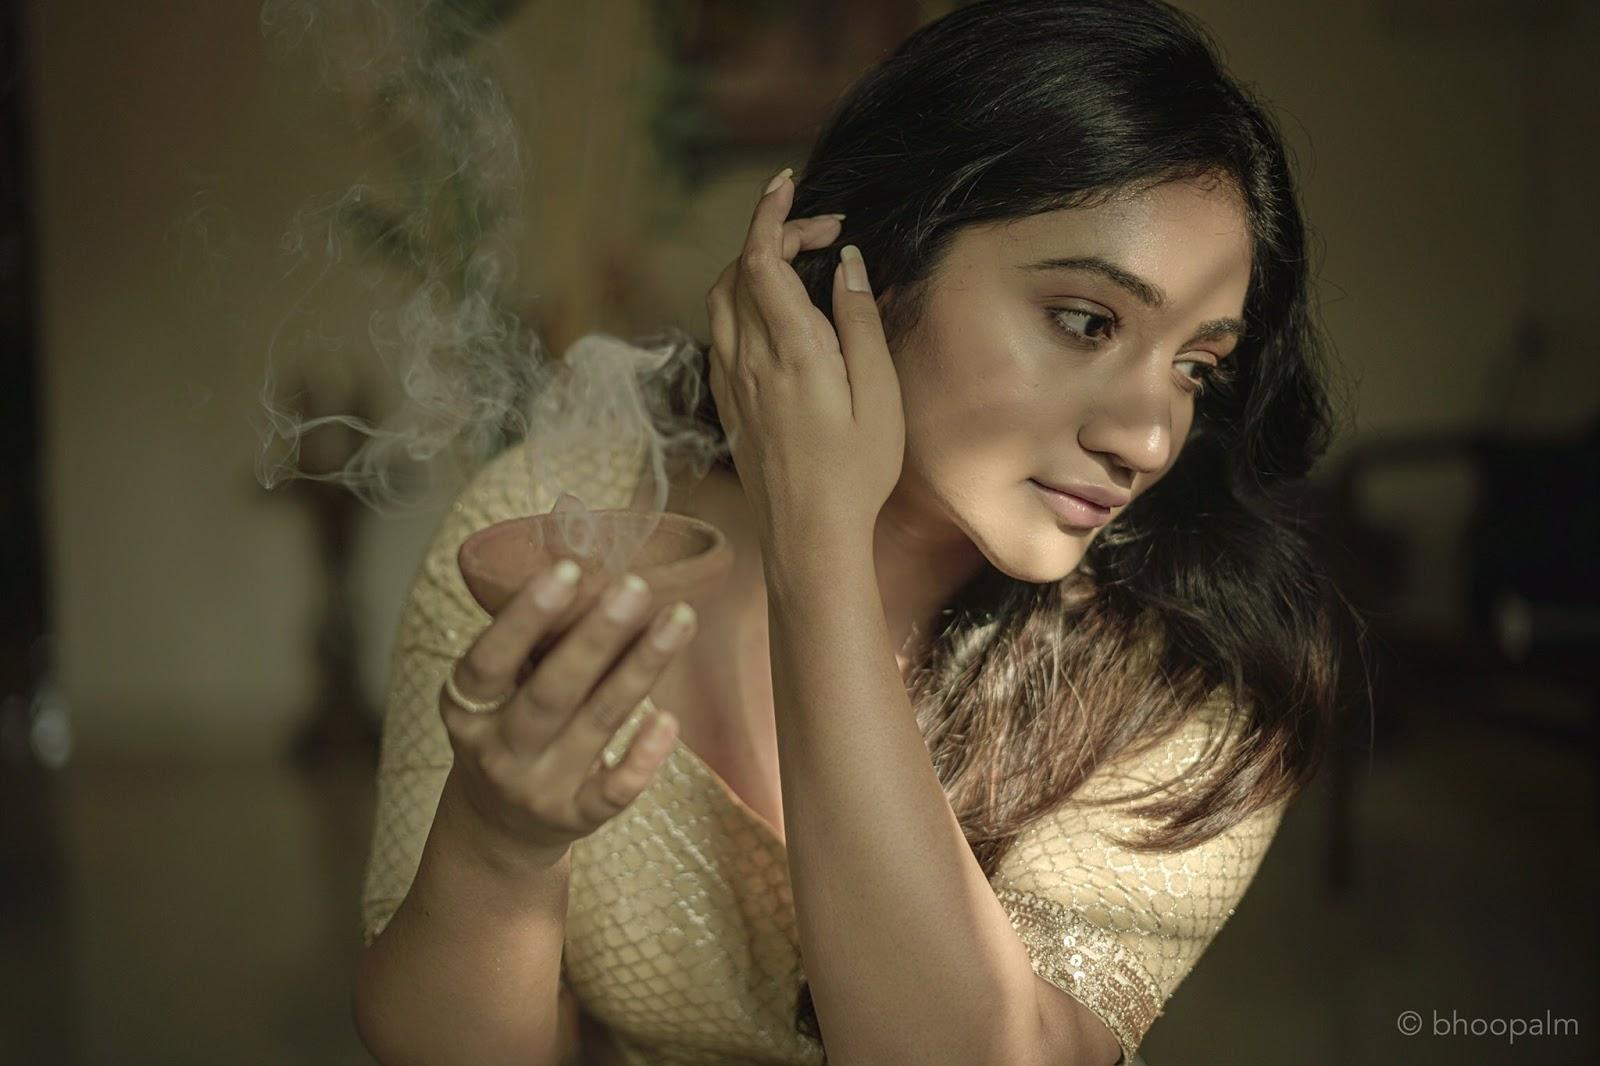 Bollywood Actress BommuLakshmi HotPhotos MakeUp BeautyTips Fashion WallPapers Biography Wikipedia MoviesList VideoSongs Photoshoots